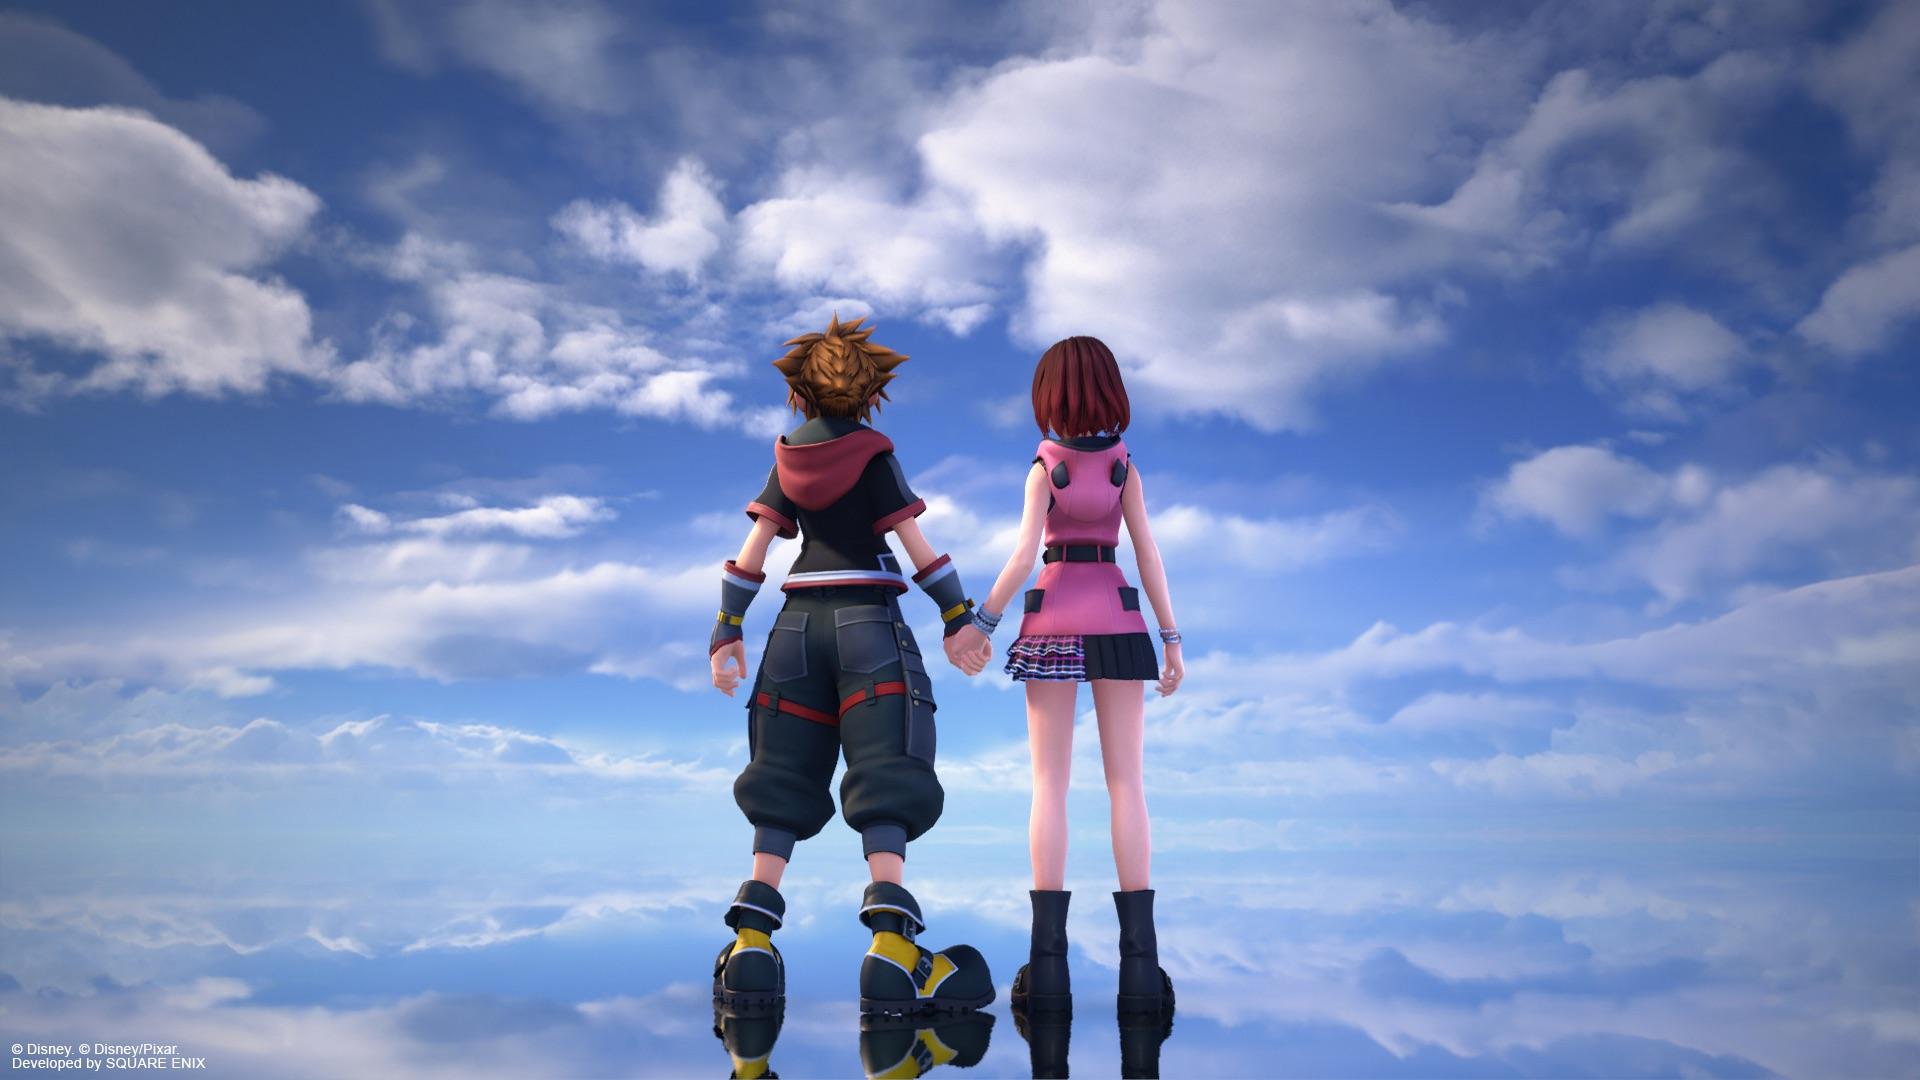 Screenshot From Kingdom Hearts III ReMind DLC